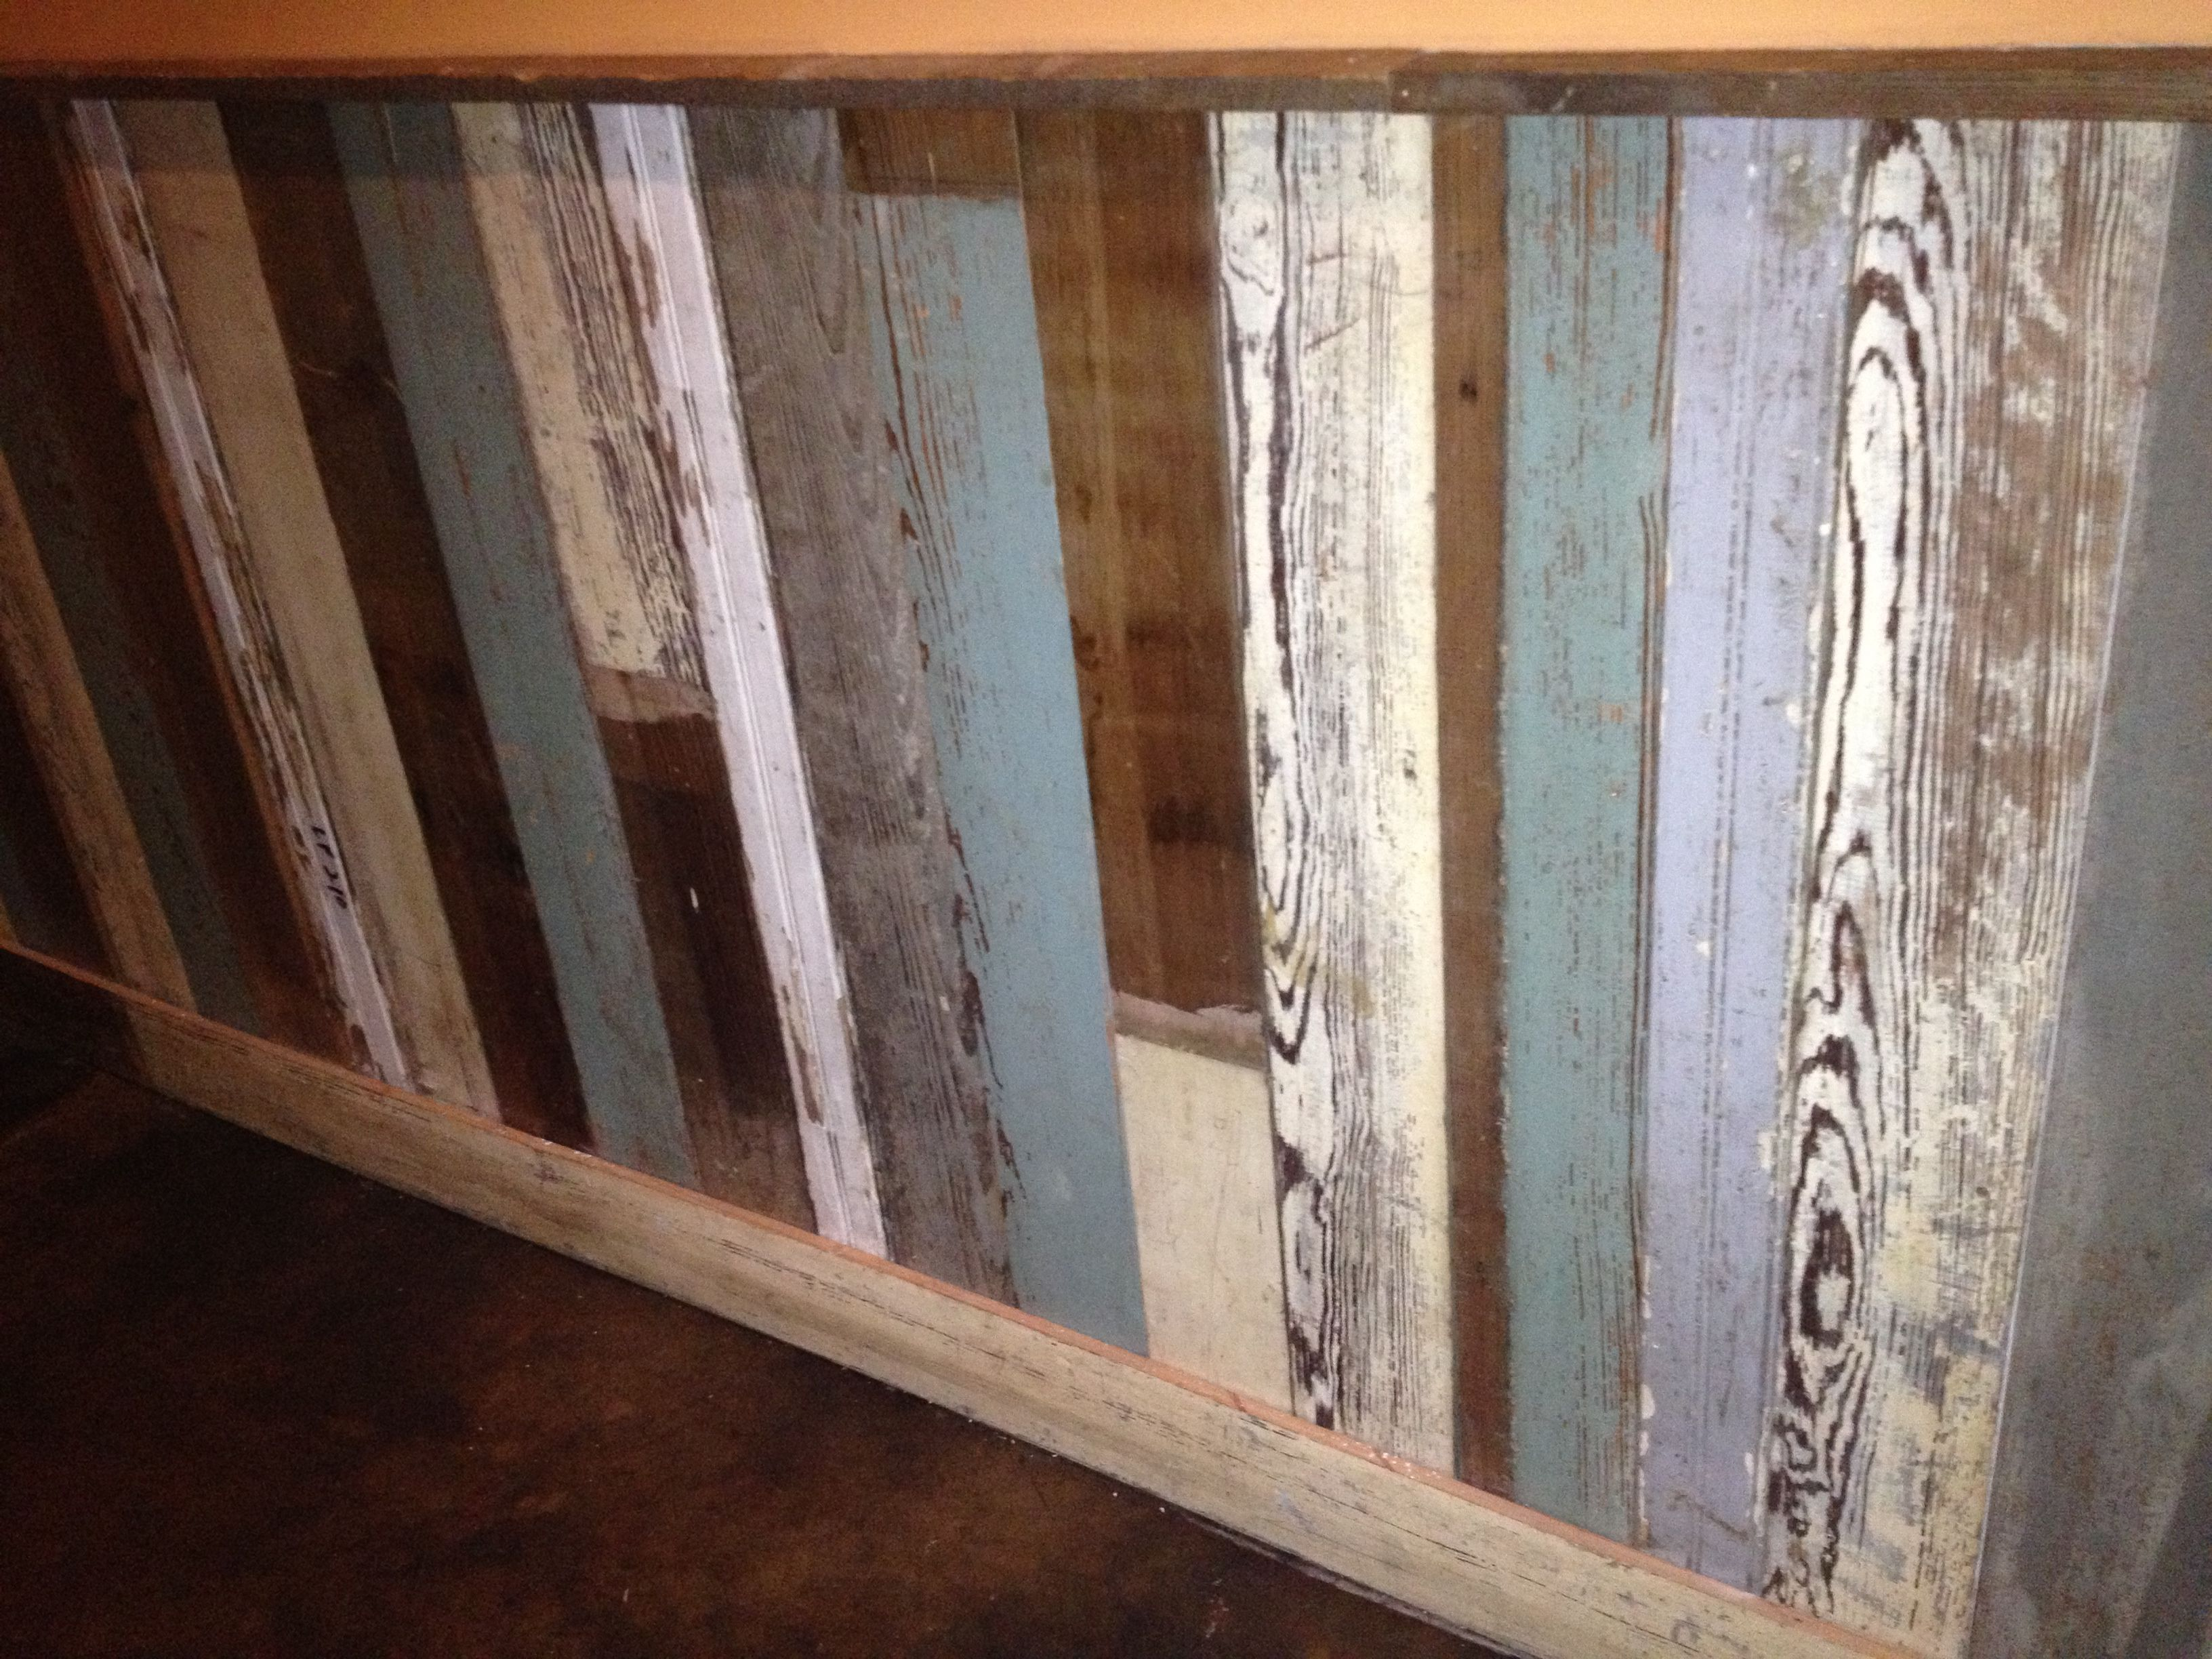 Barn Wood Wainscoting: Reclaimed Wainscoting. Love!